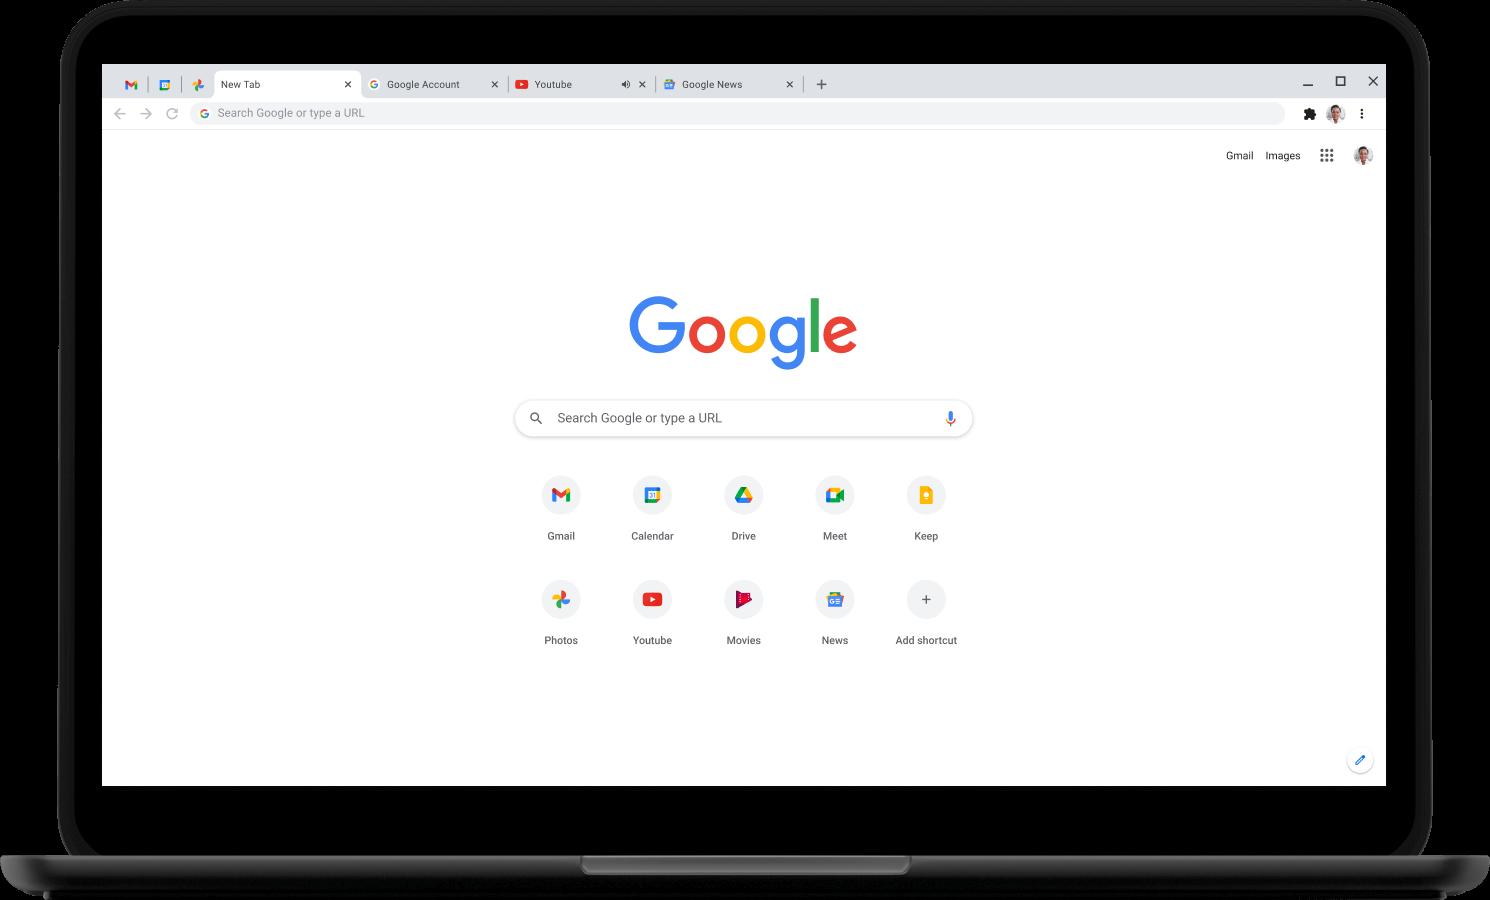 chrome - Google Chrome 88.0.4324.182 διορθώνει 10 κενά ασφαλείας